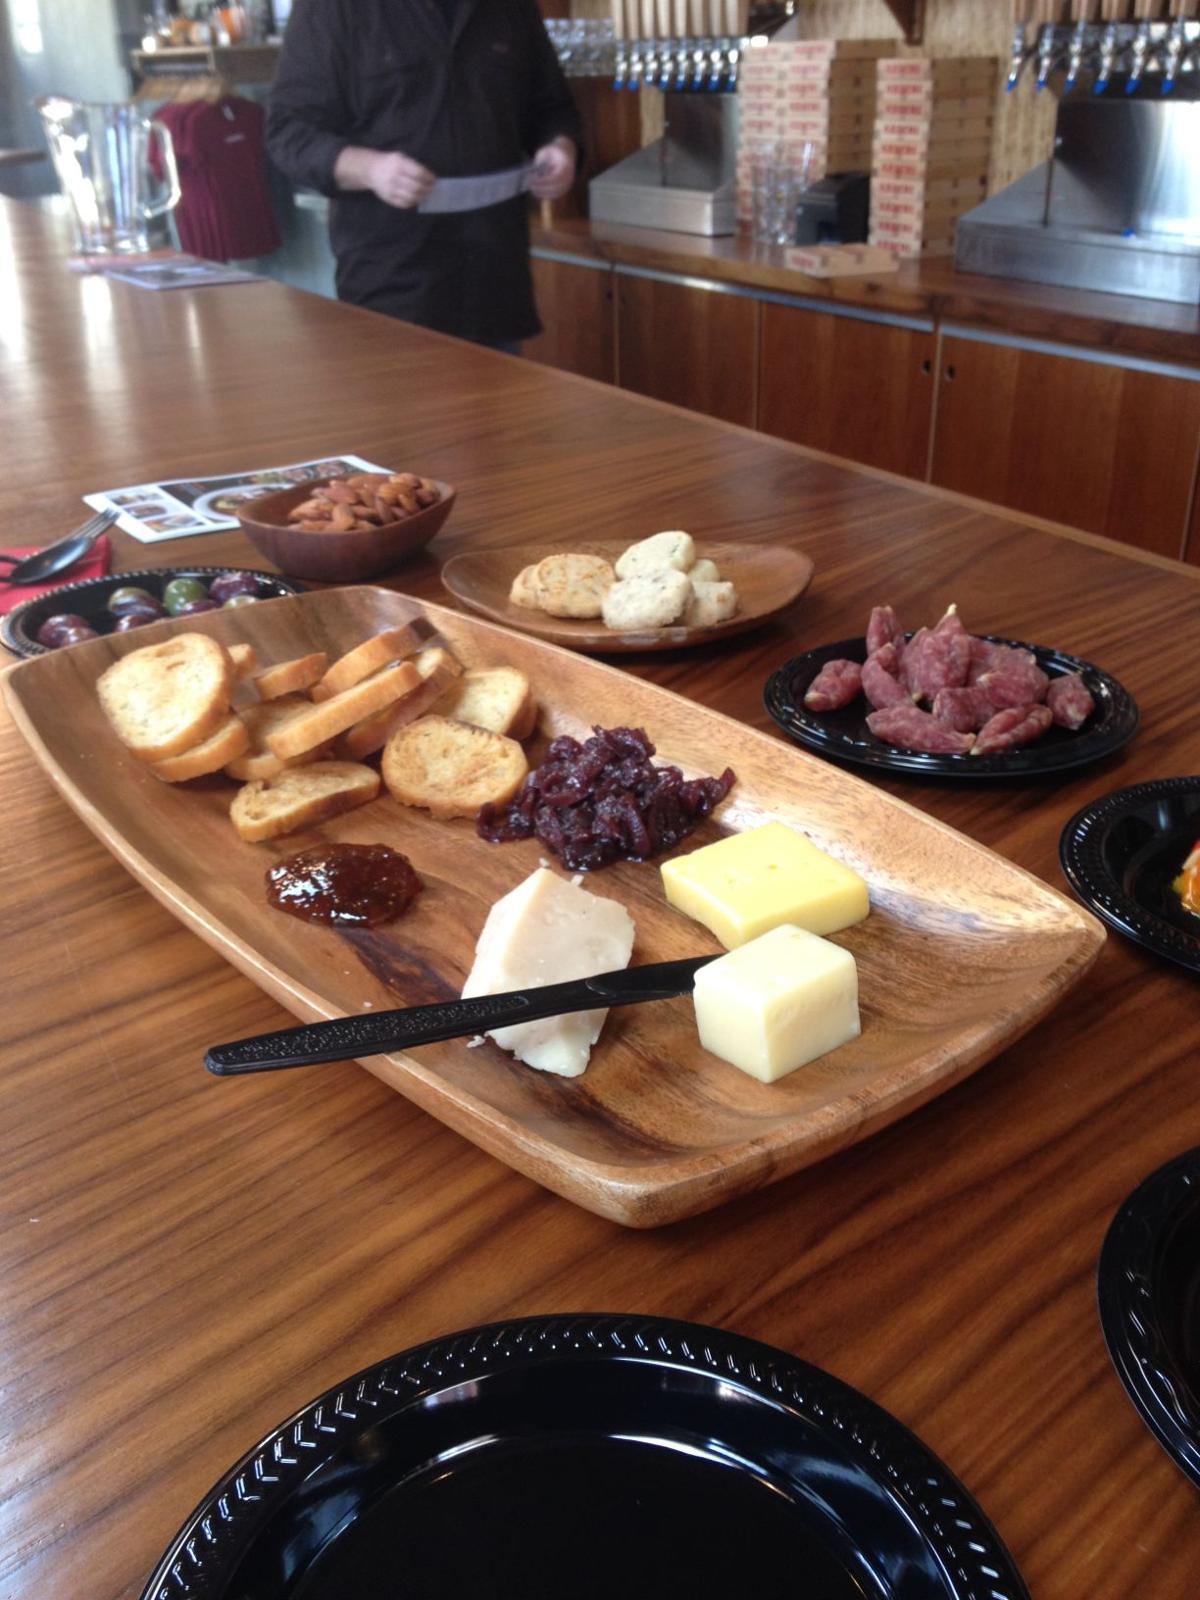 New Small Plates Menu at Ardent Craft Ales | Restaurant News ...